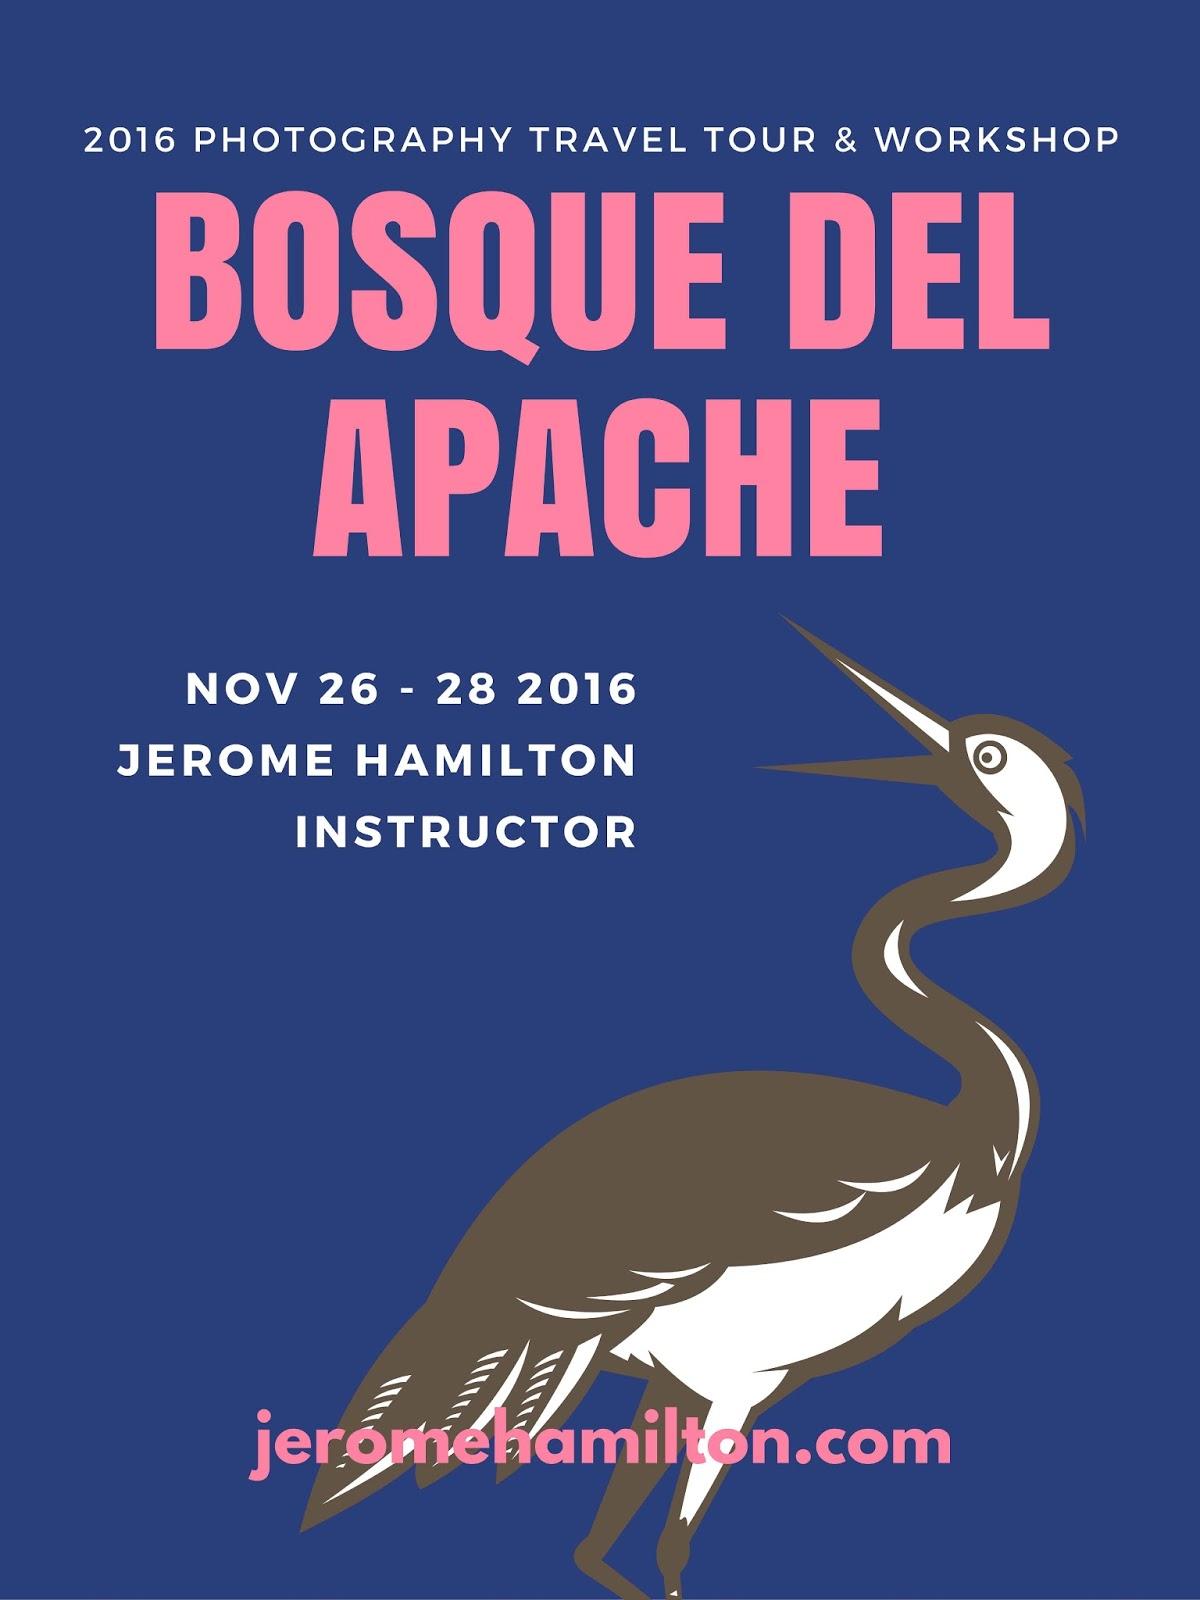 c12f00b84a5 Bosque Del Apache 2016 Photography Travel Tour and Workshop by Jerome  Hamilton